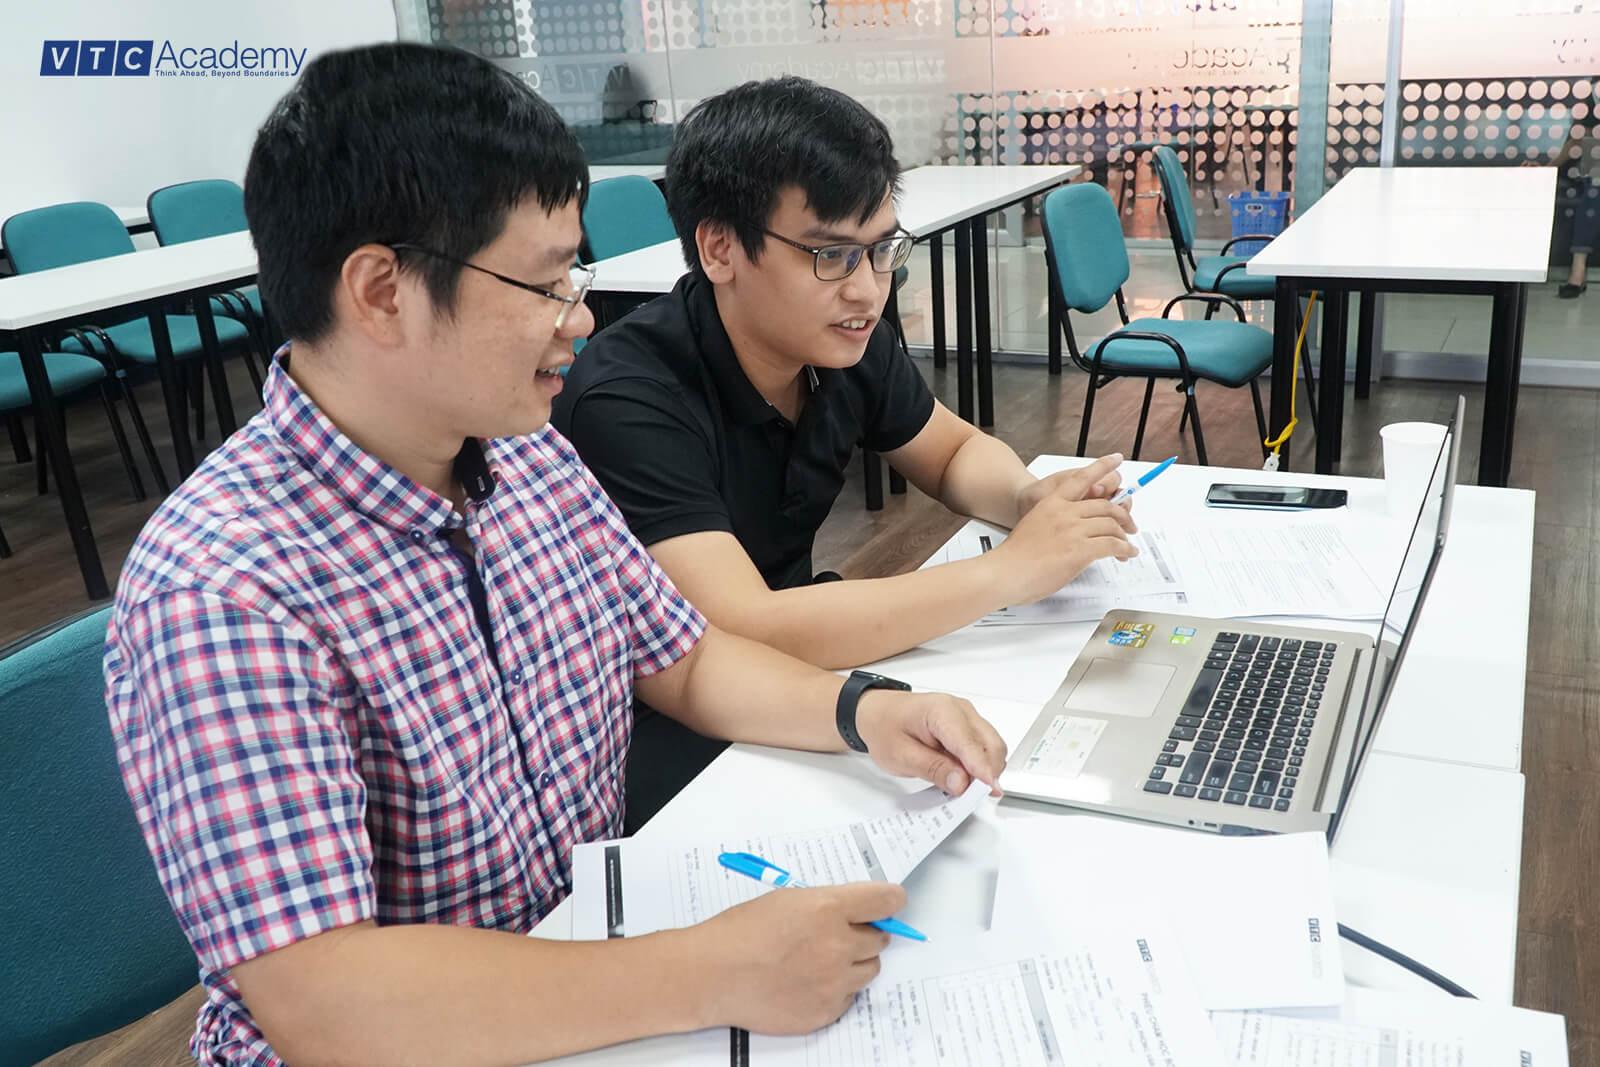 ngay-hoi-hoc-bong-vtc-academy-2021-hn-2